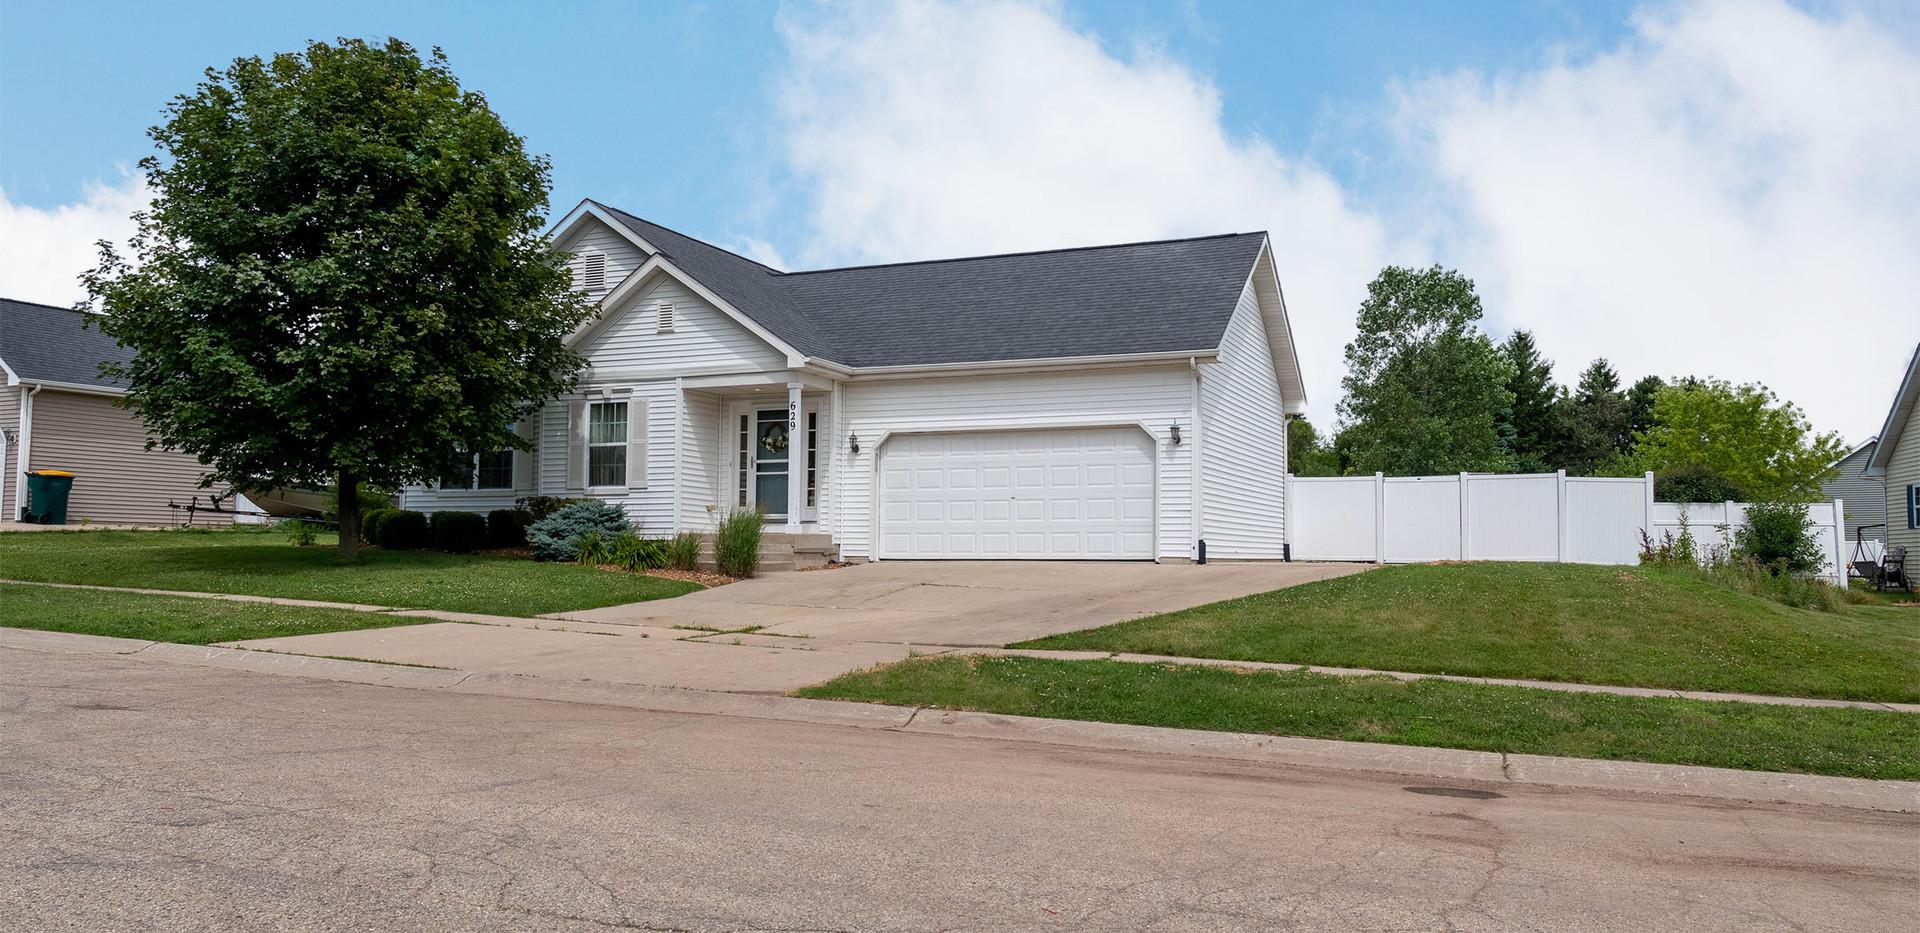 tim-kunes-house-exterior-1.jpg